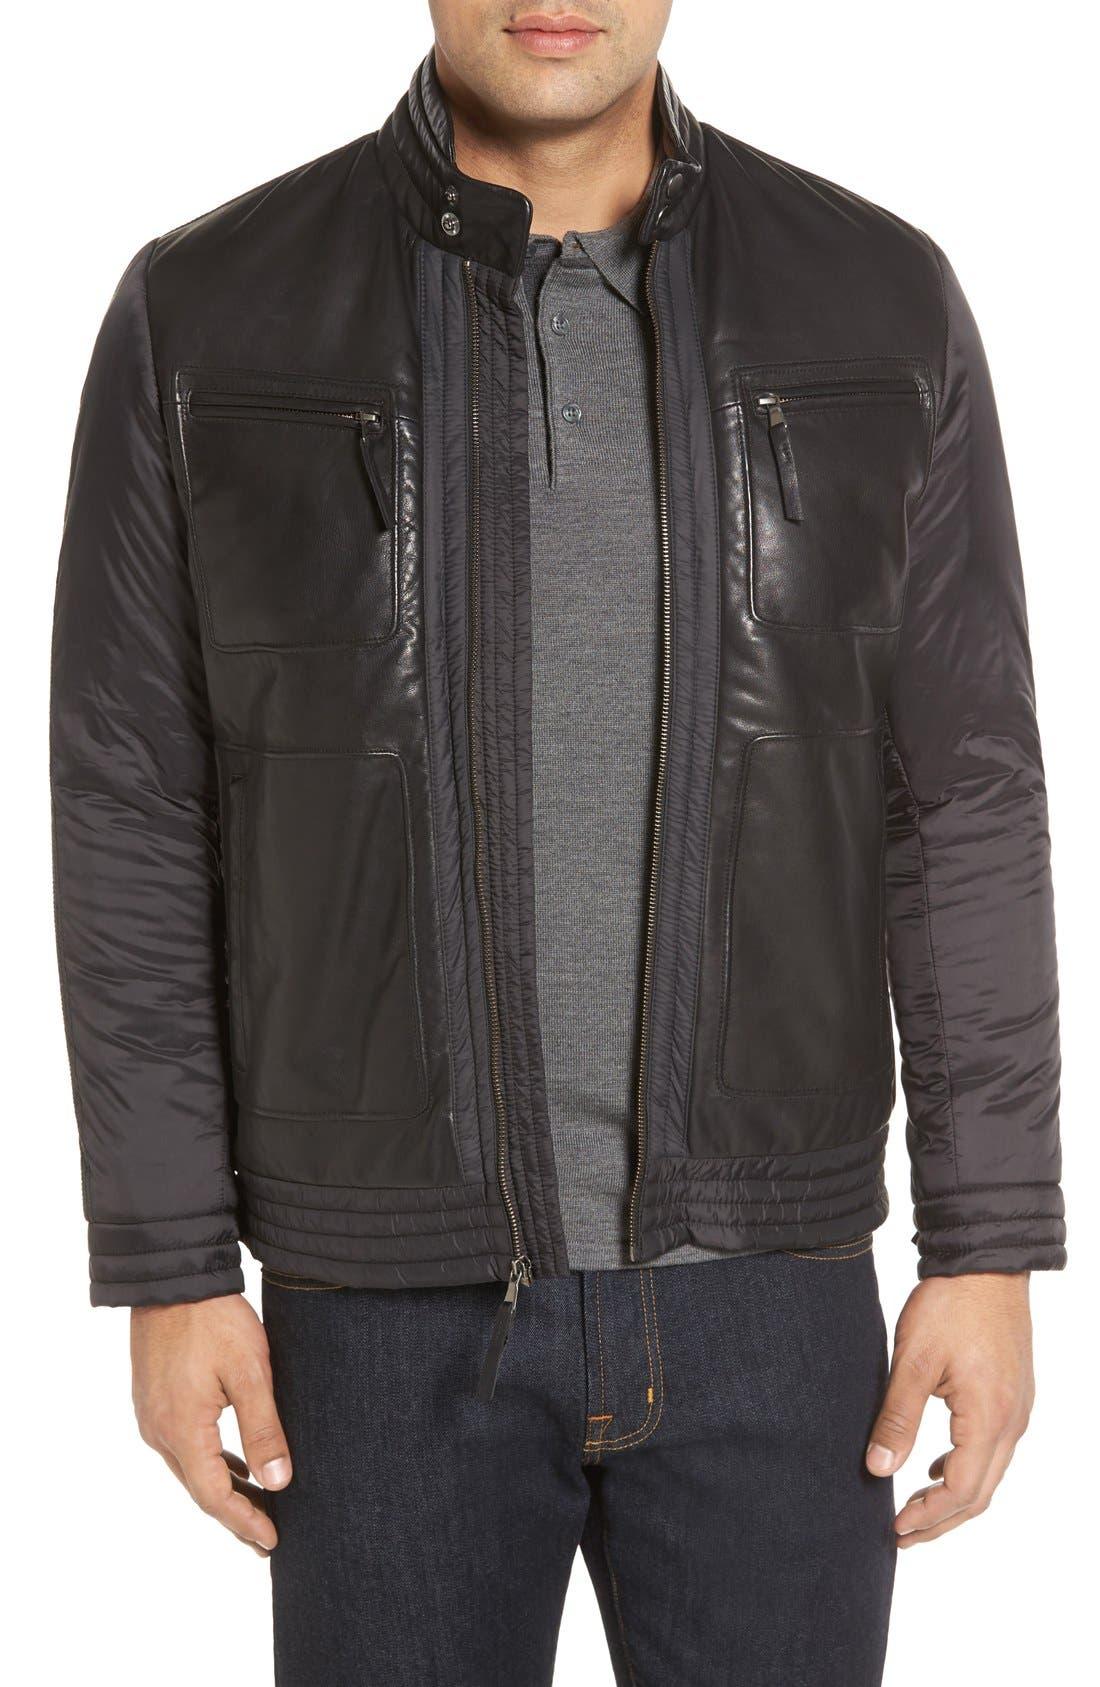 Main Image - Missani Le Collezioni Leather Trimmed Nylon Jacket